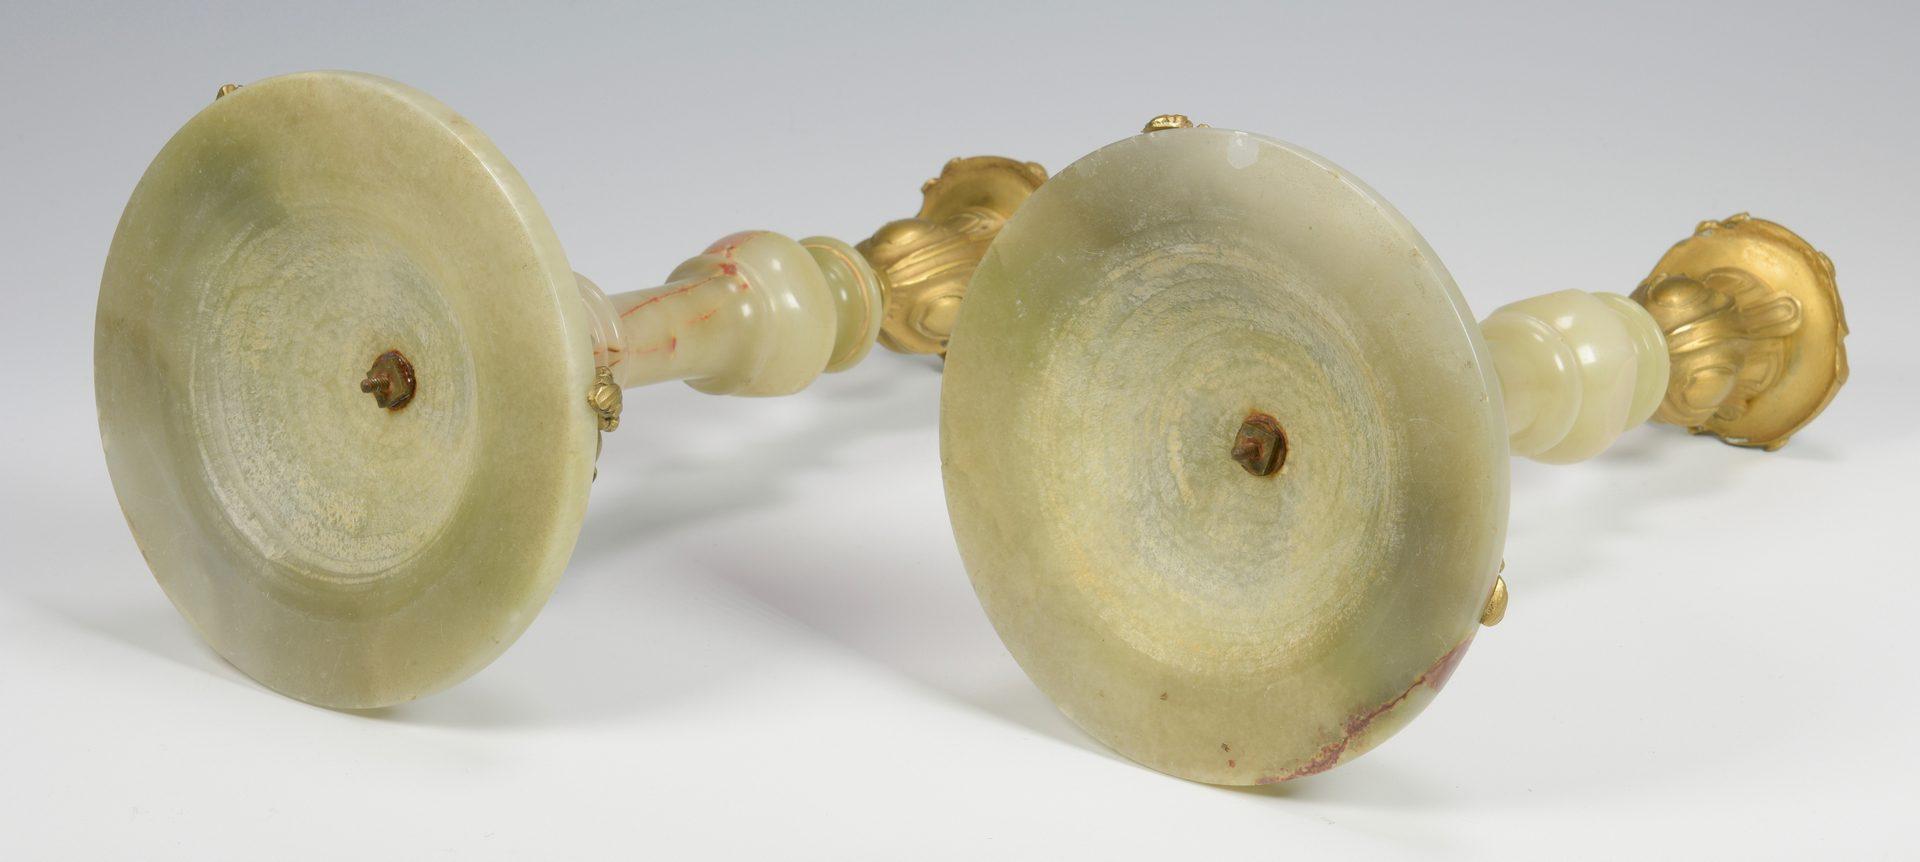 Lot 384: Pr. of Italian Marble & Gilt Bronze Candlesticks